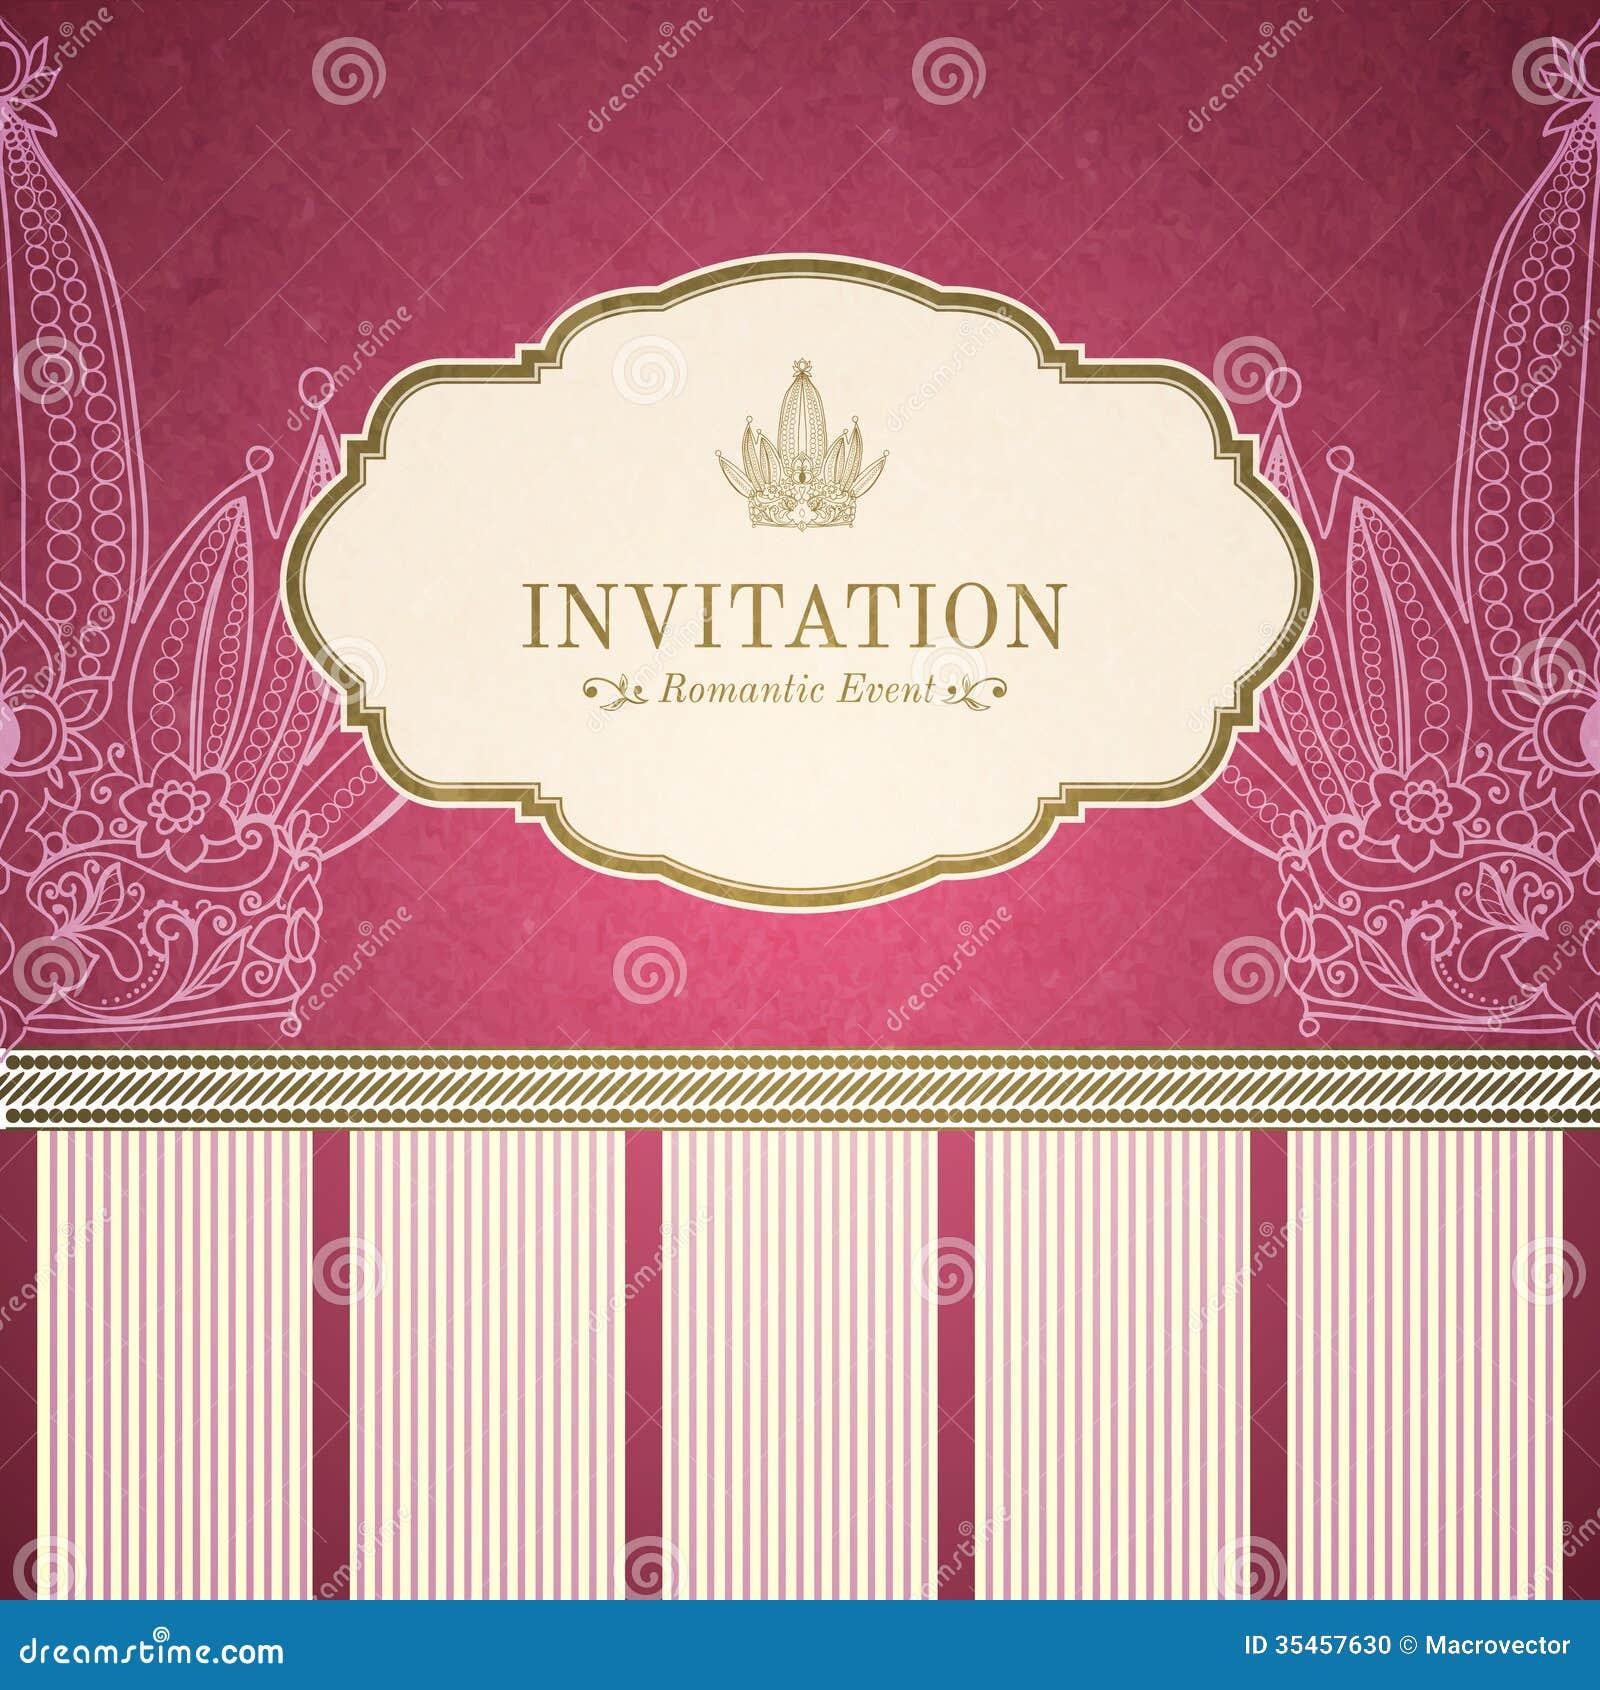 retro princess invitation template stock photo image 35457630 retro princess invitation template